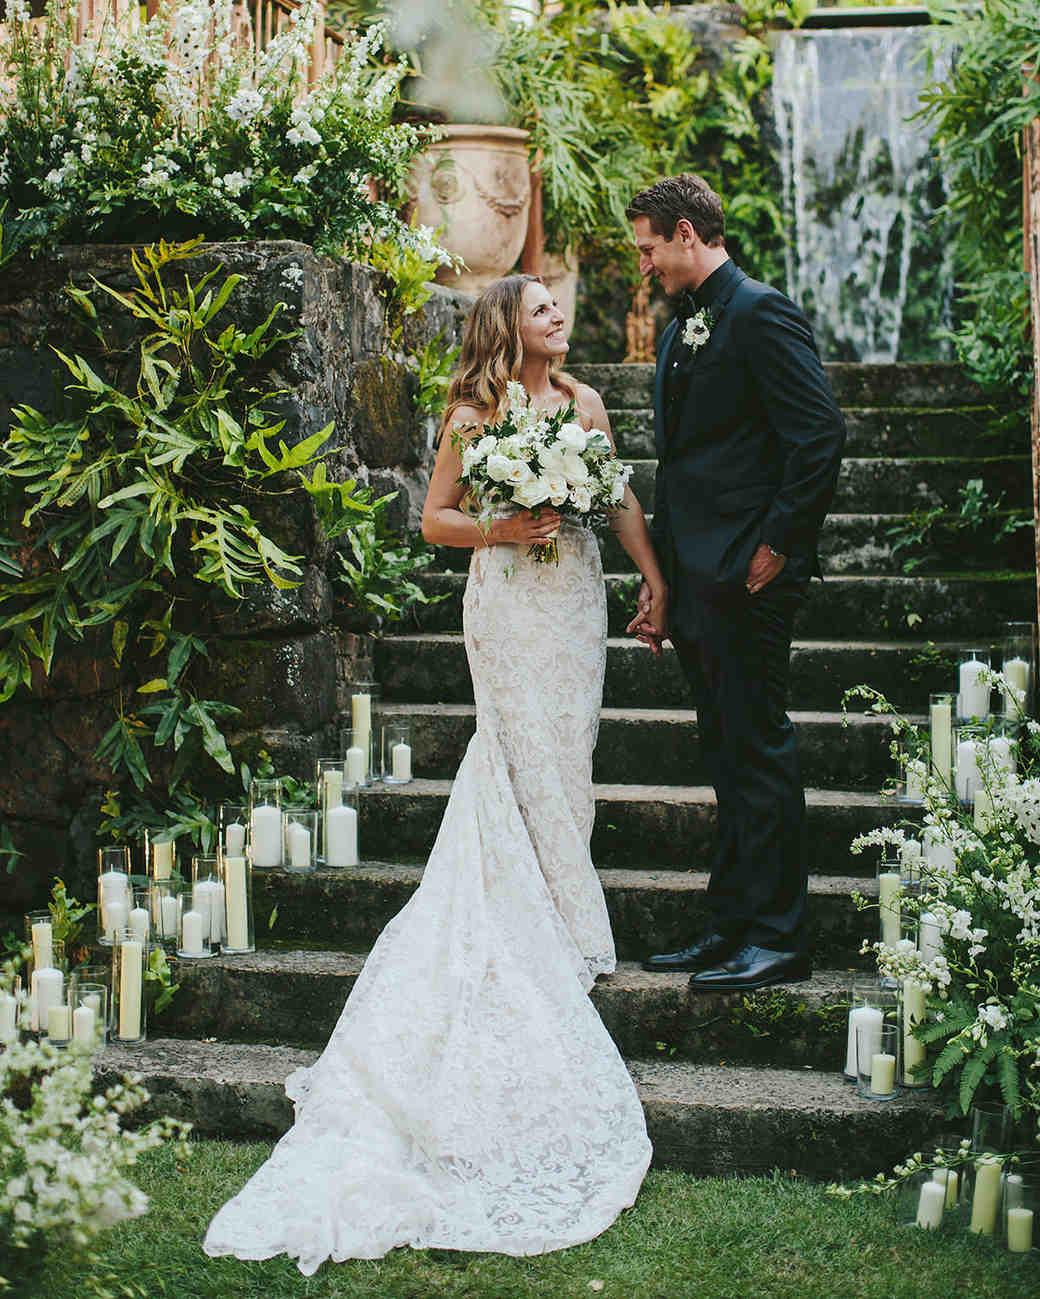 sarah daniel wedding bride and groom on steps